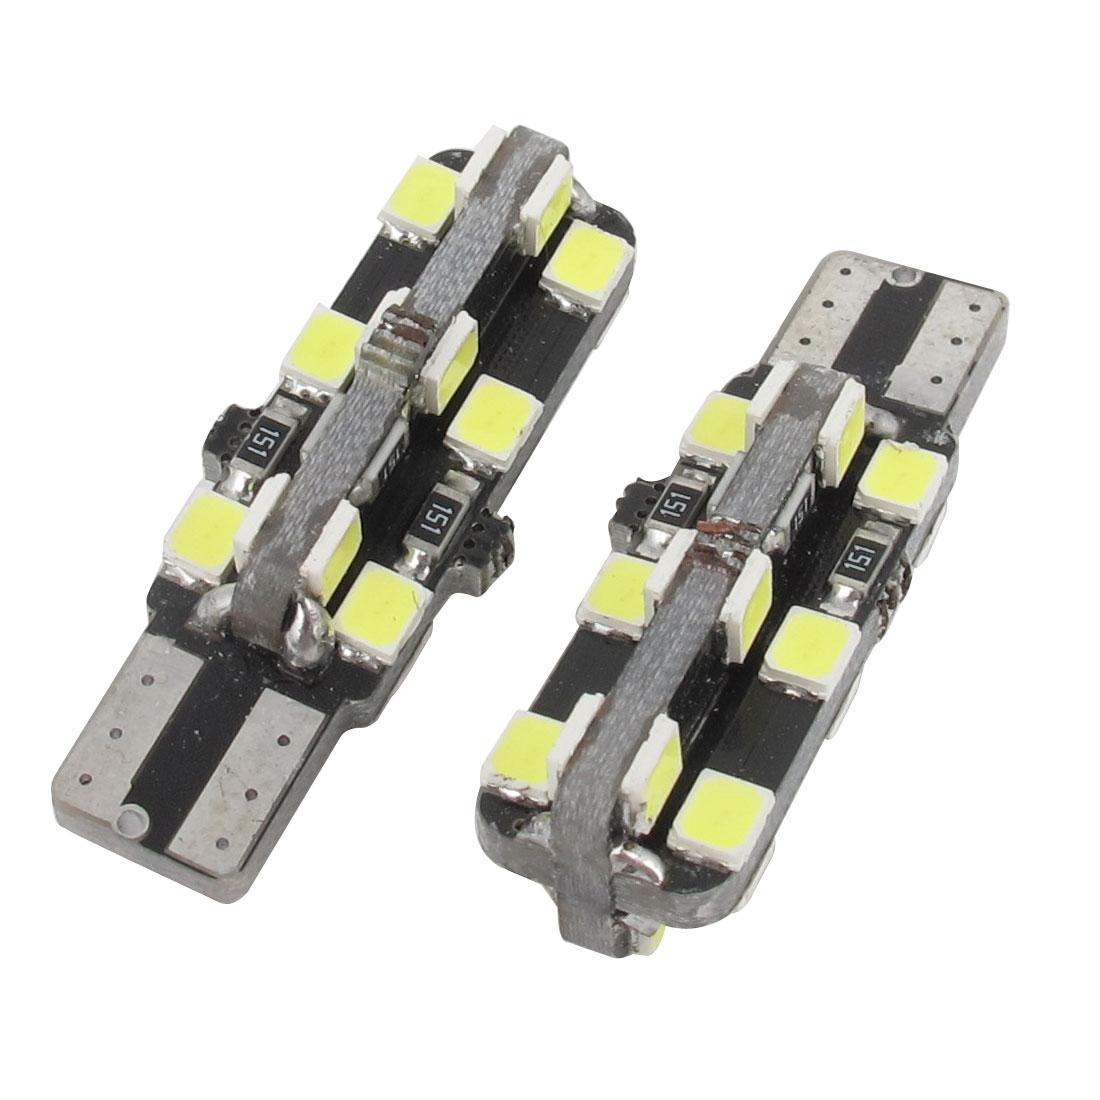 2 Pcs T10 White 24 LED 2538 SMD Tail Brake Light Bulbs for Car Vehicle Internal